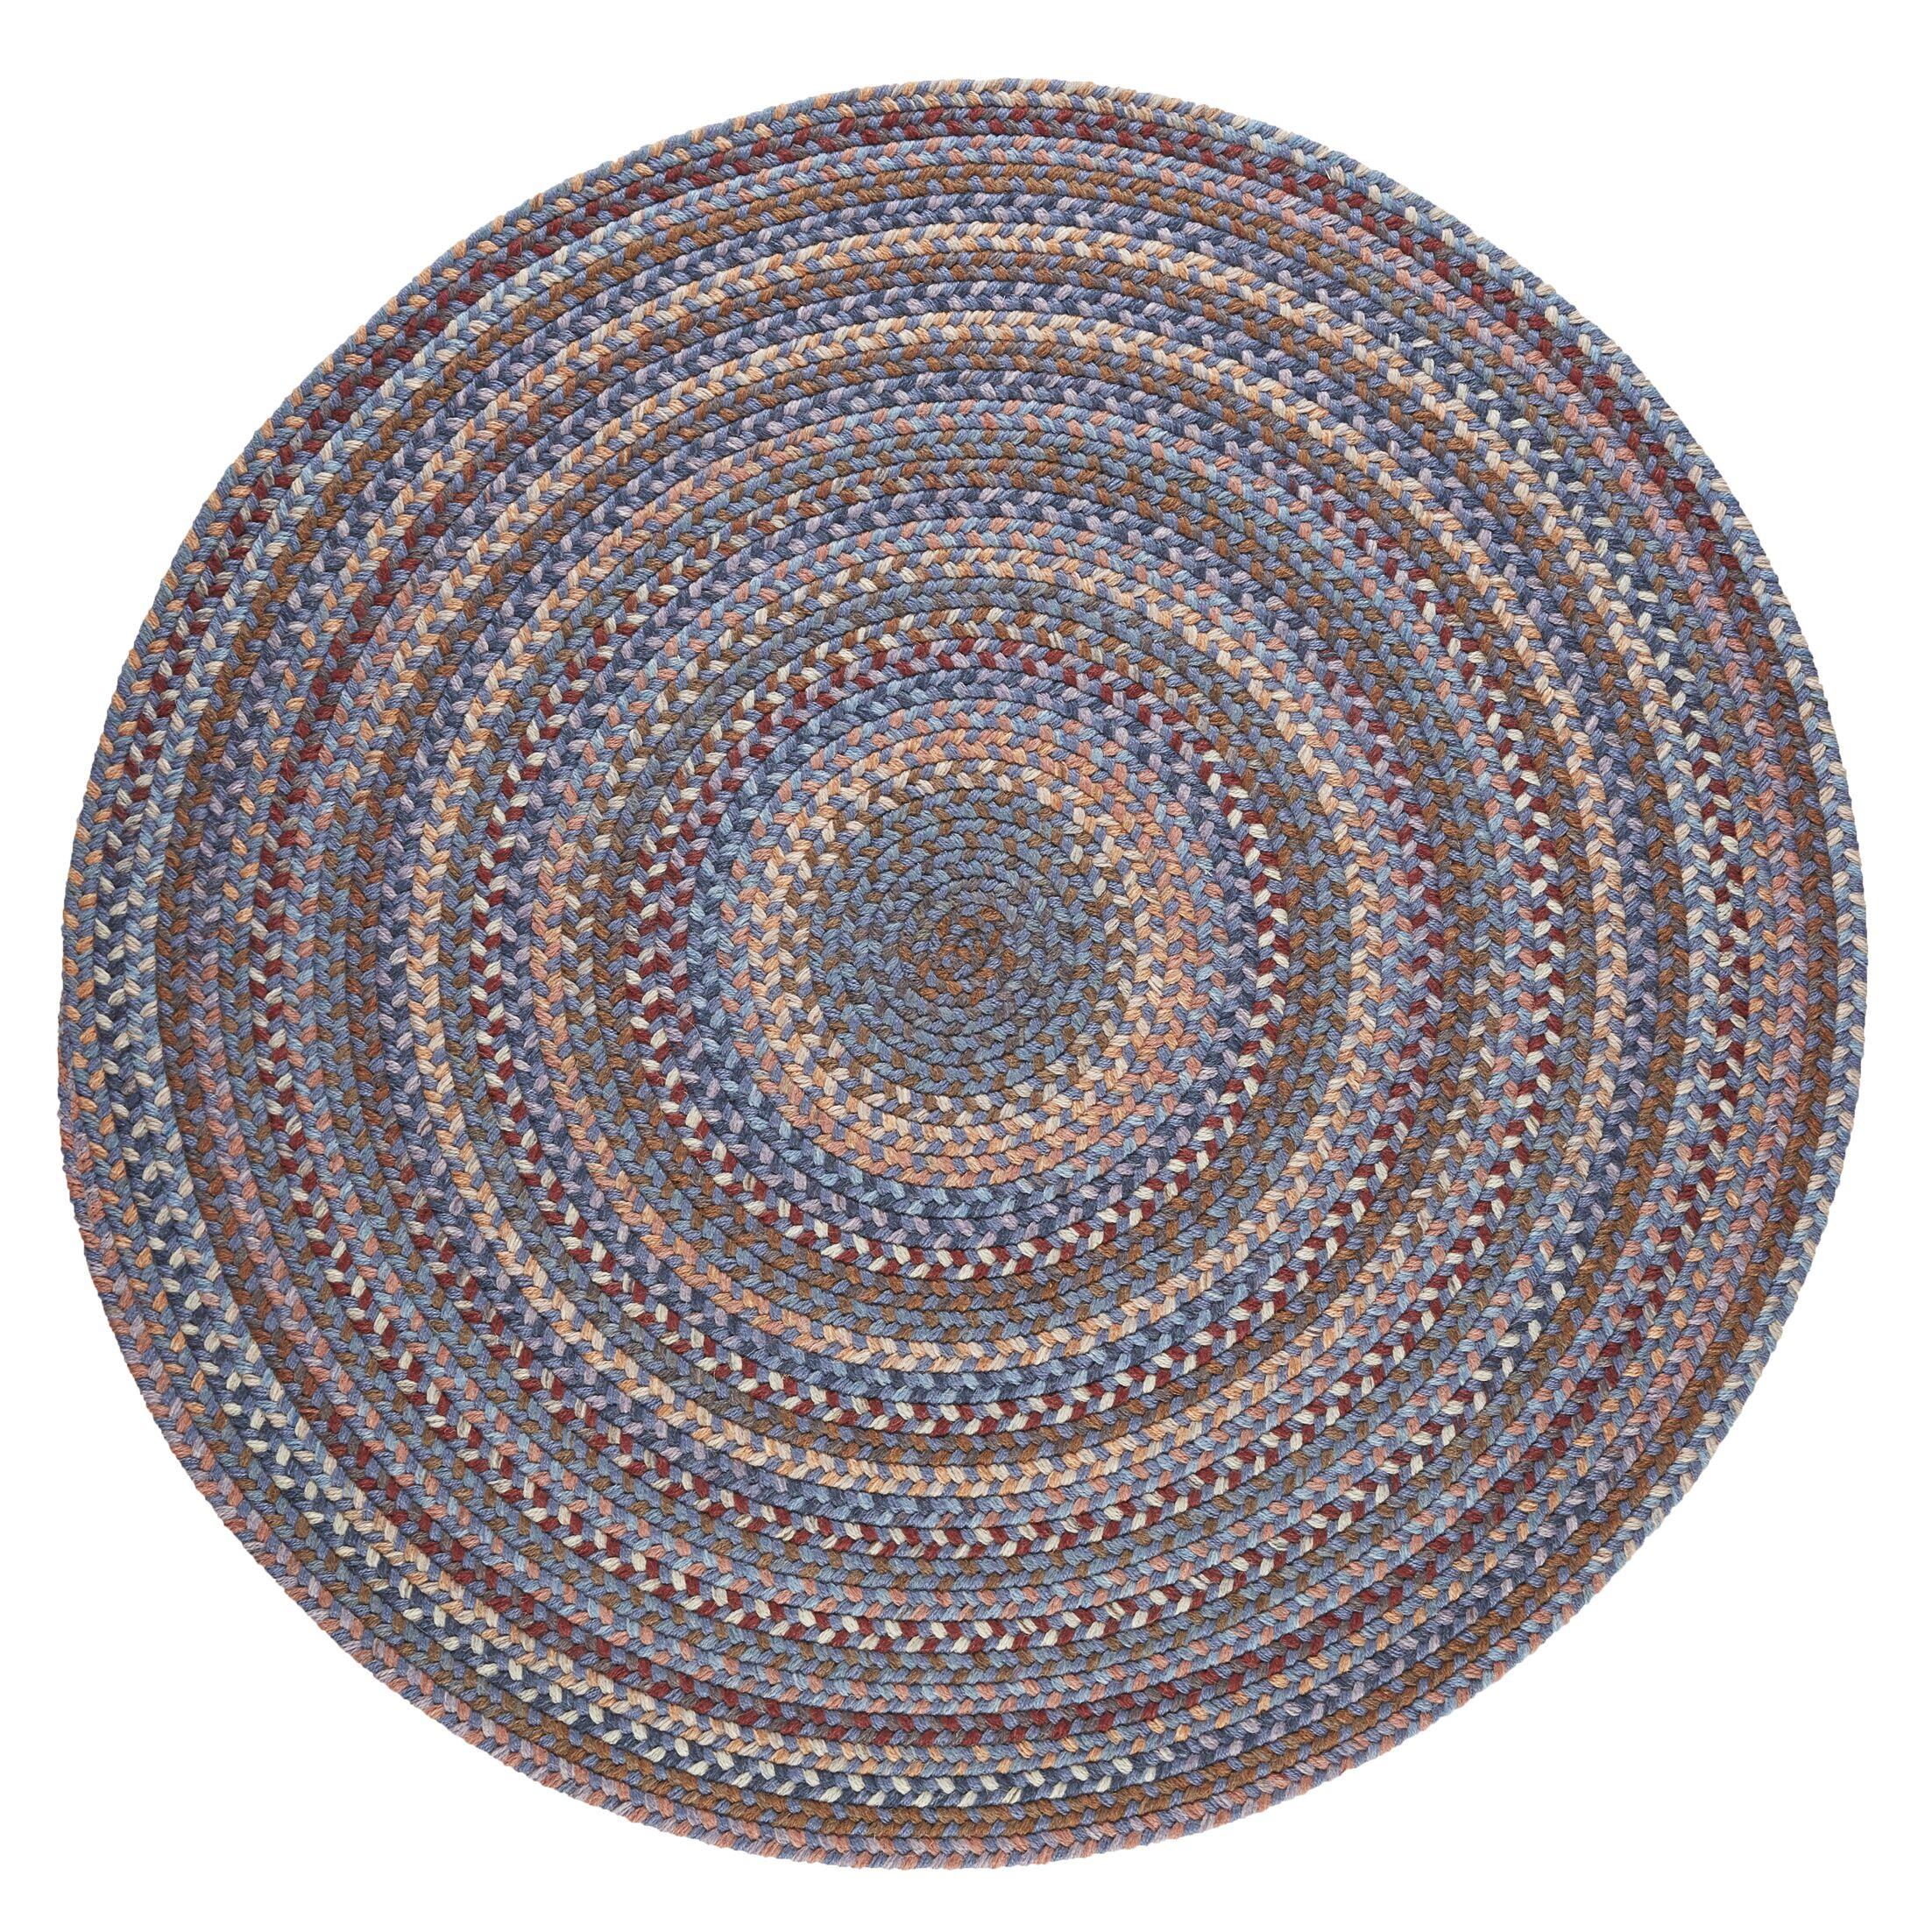 Handmade Blue Area Rug Rug Size: Round 10'